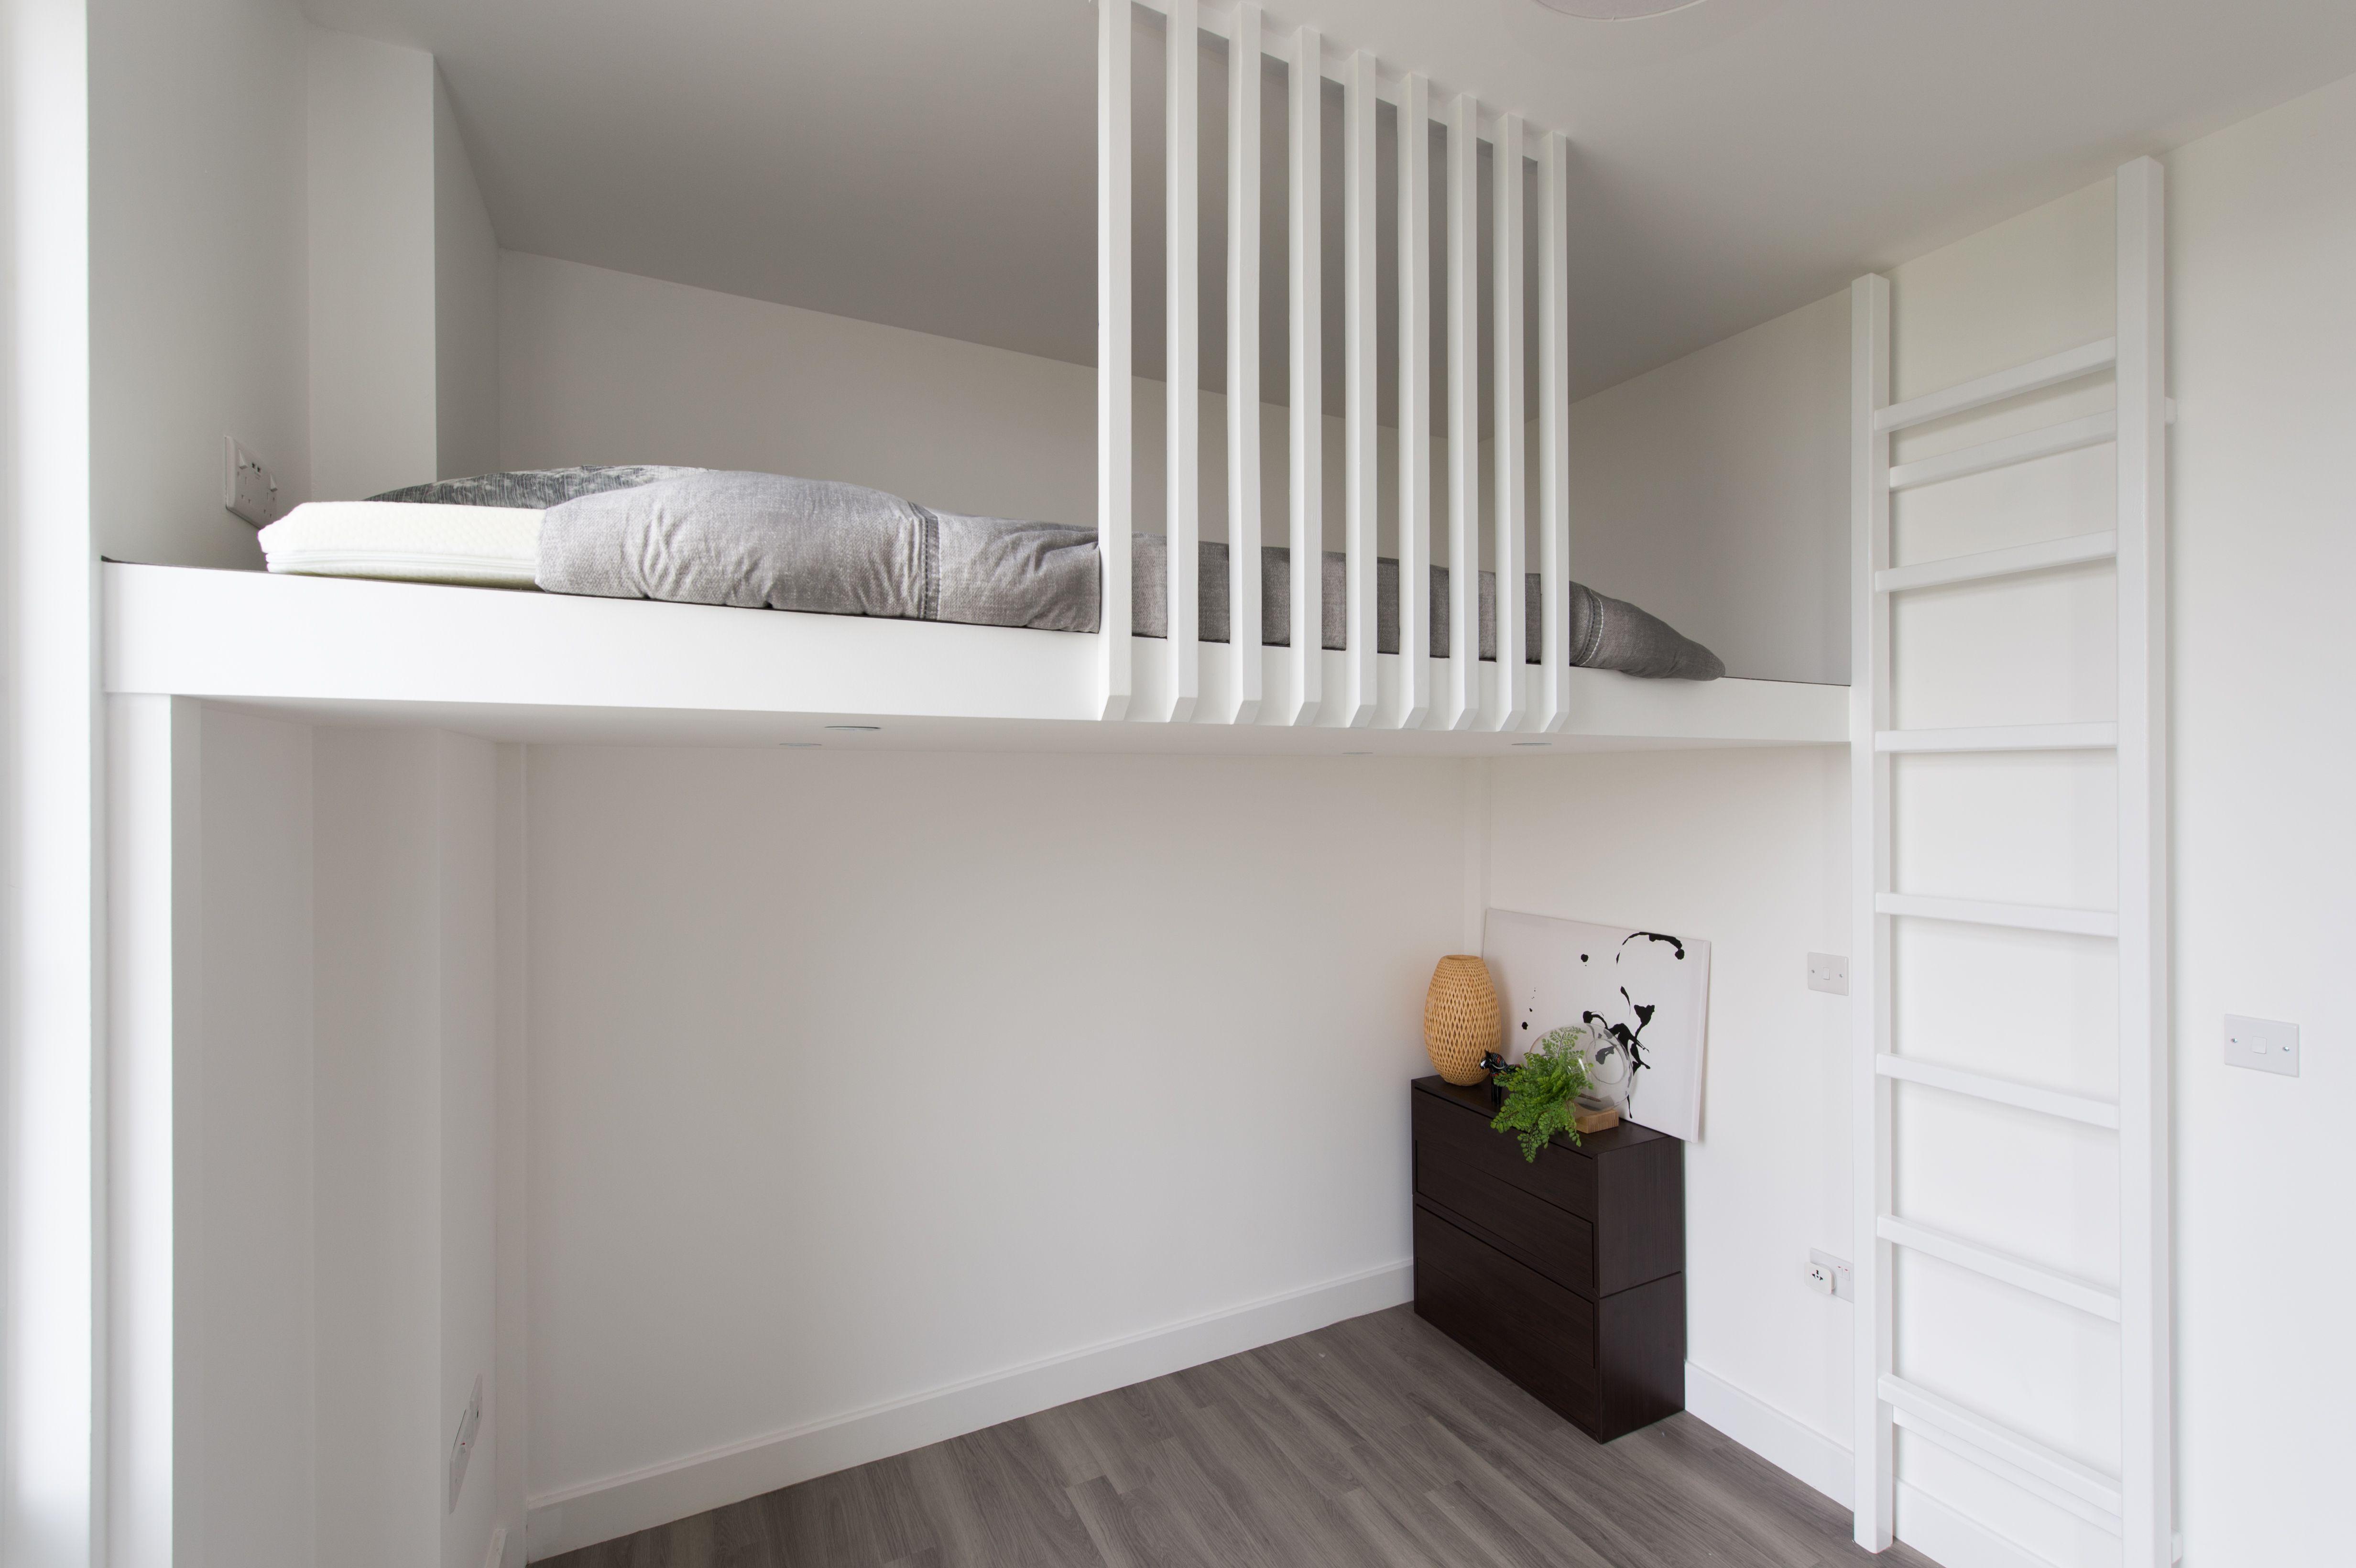 Scandinavian Loft, Bespoke design, Compact living, Mezzanine Loft, oak  wood, Loft Bed, bespoke loft beds, Storage, Home improvement, Creating Space,